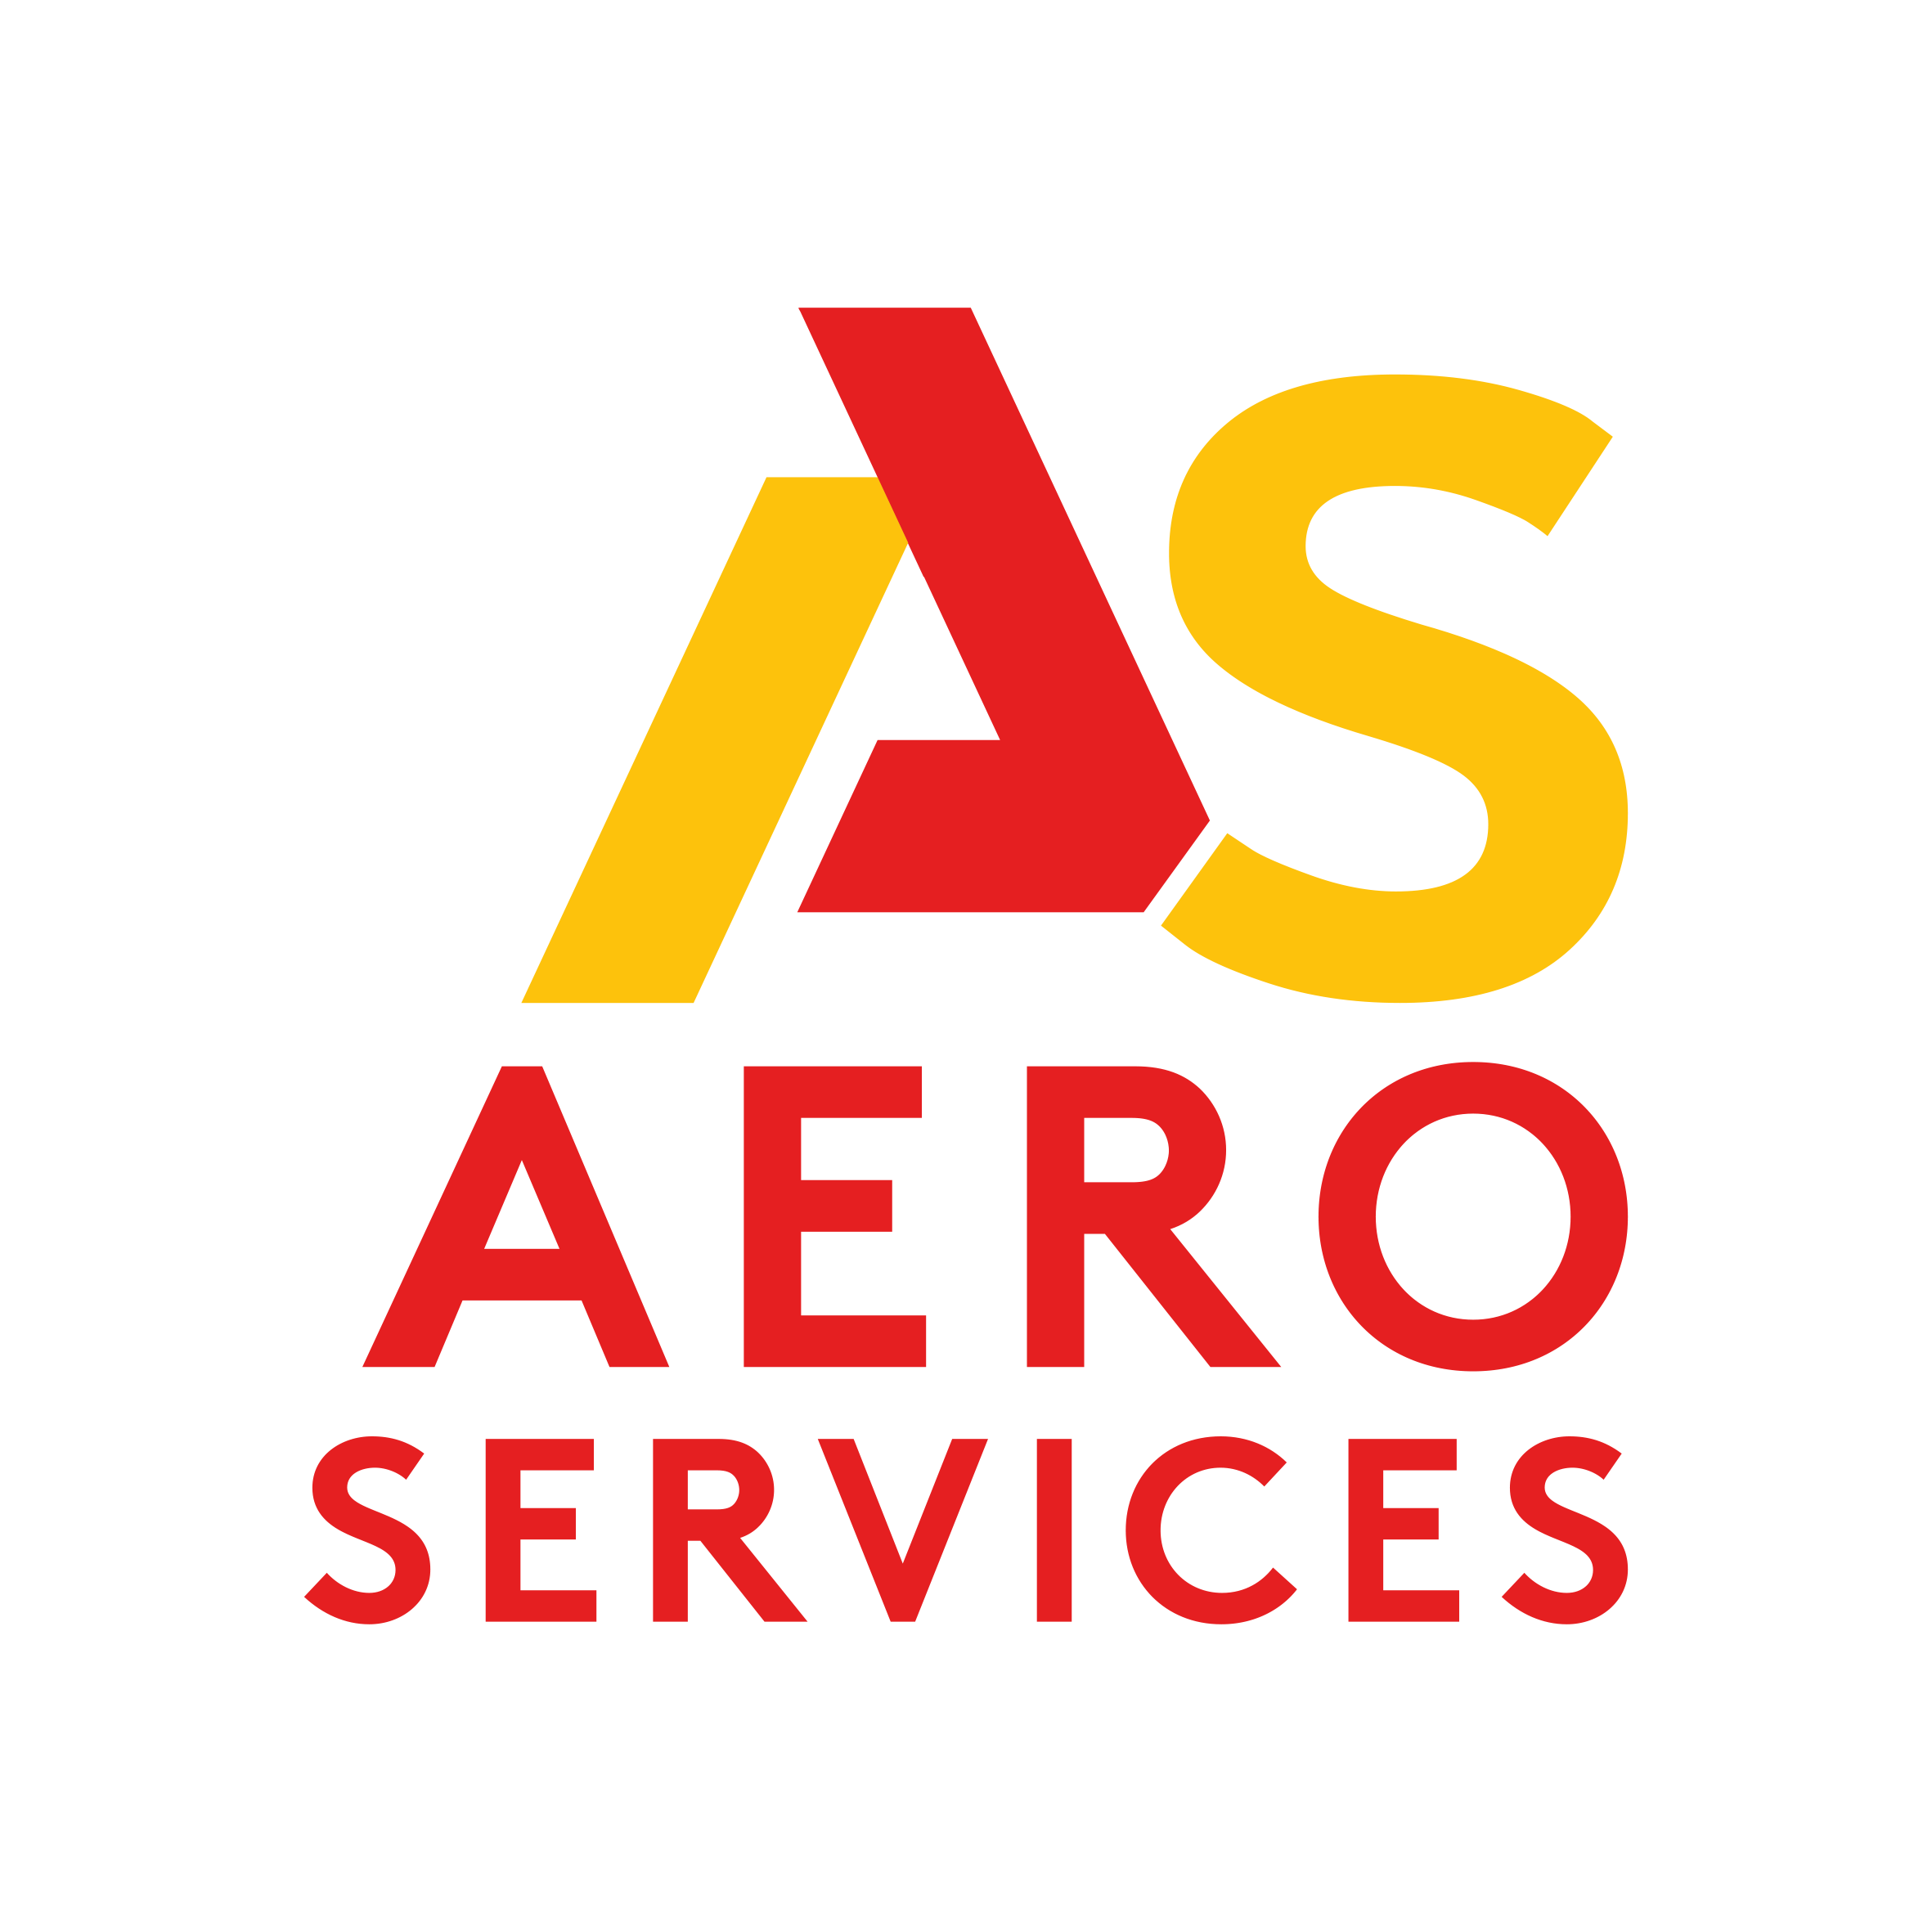 Aero Services